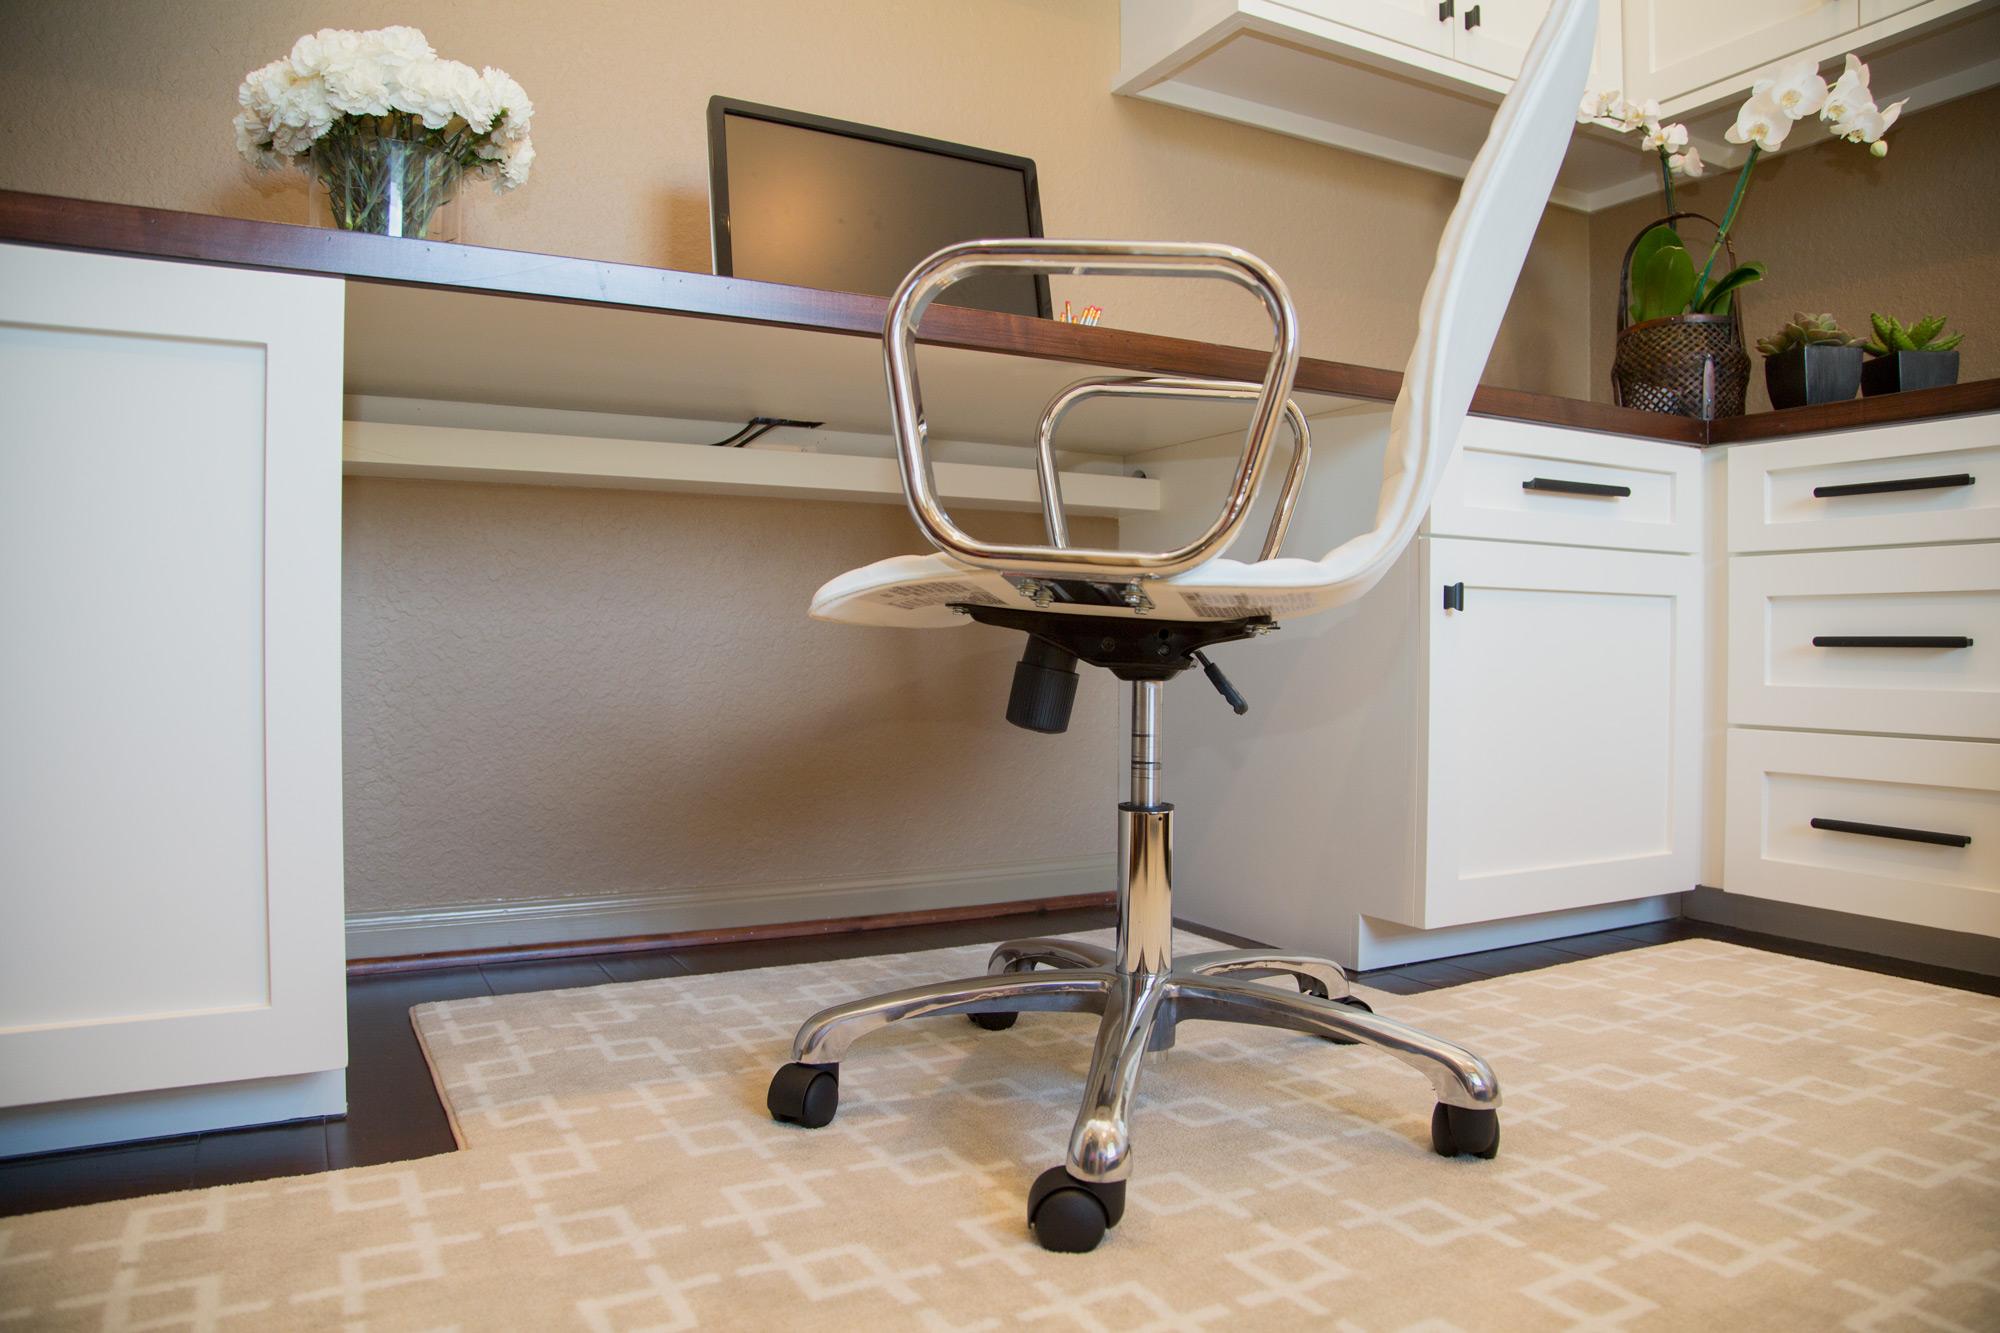 Home office remodel; desk; chair; rug; decor | Interior Designer: Carla Aston / Photography by Tori Aston